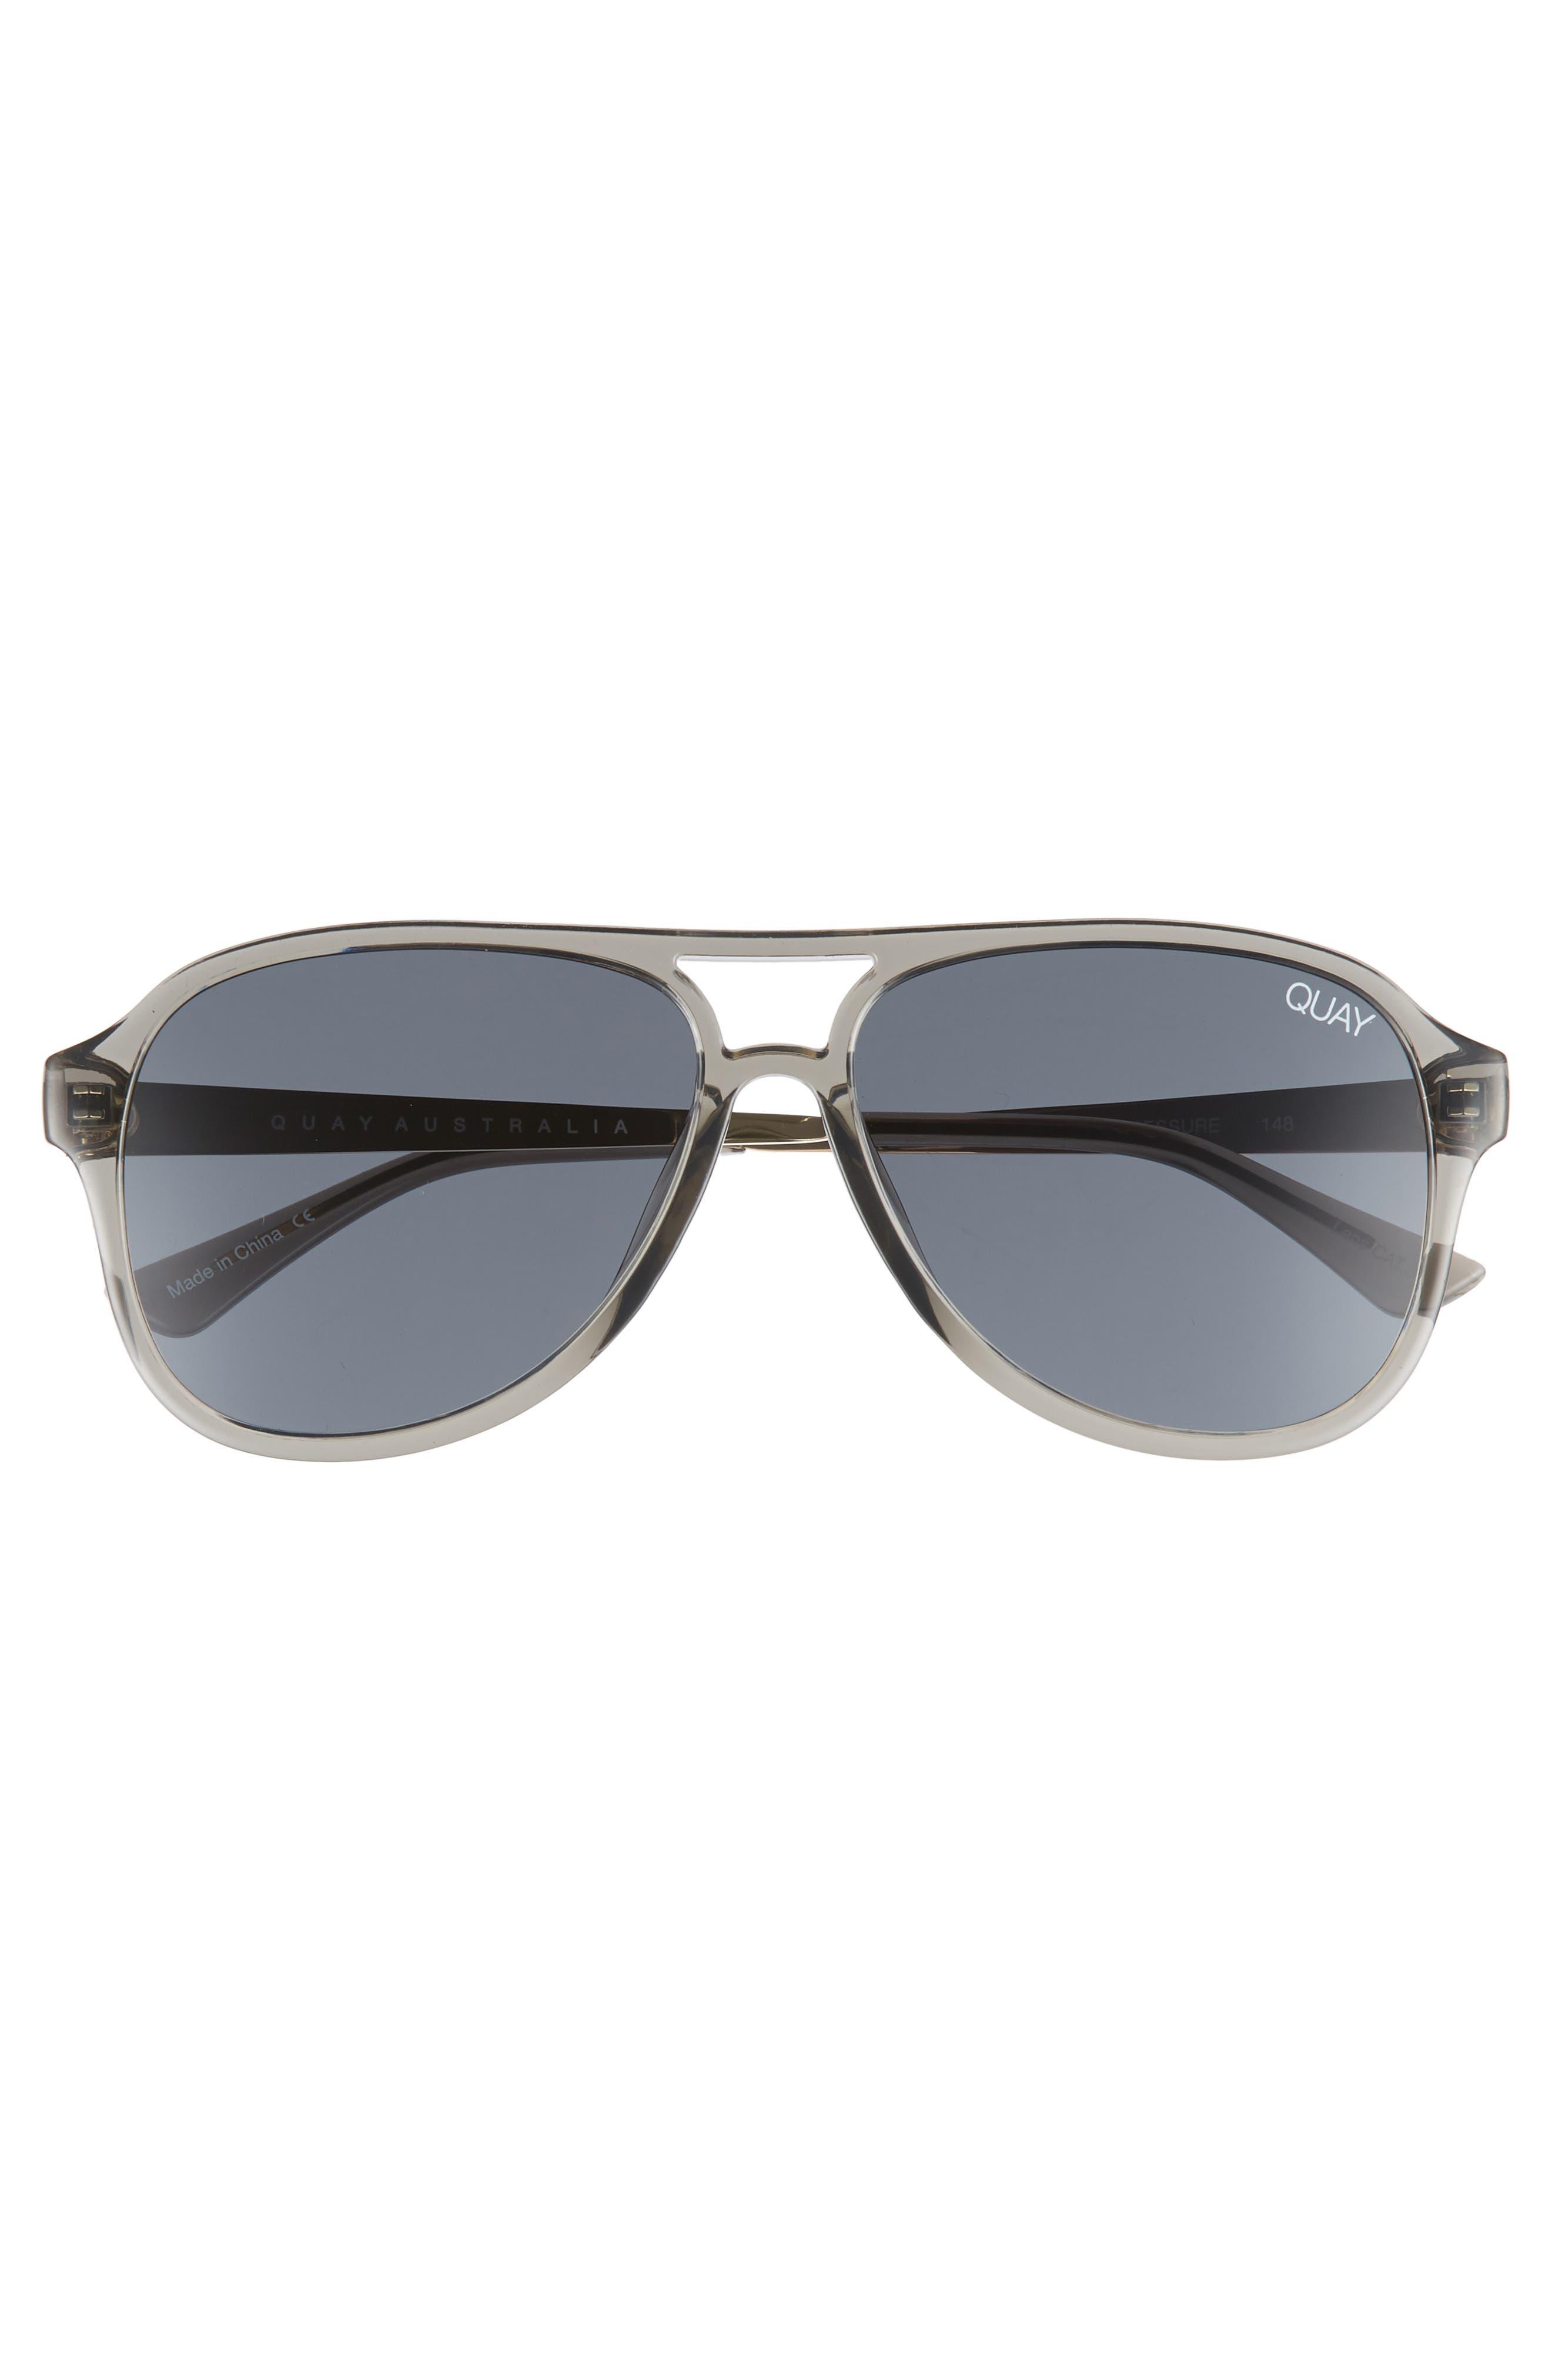 Under Pressure 58mm Aviator Sunglasses,                             Alternate thumbnail 3, color,                             GREY/ SMOKE